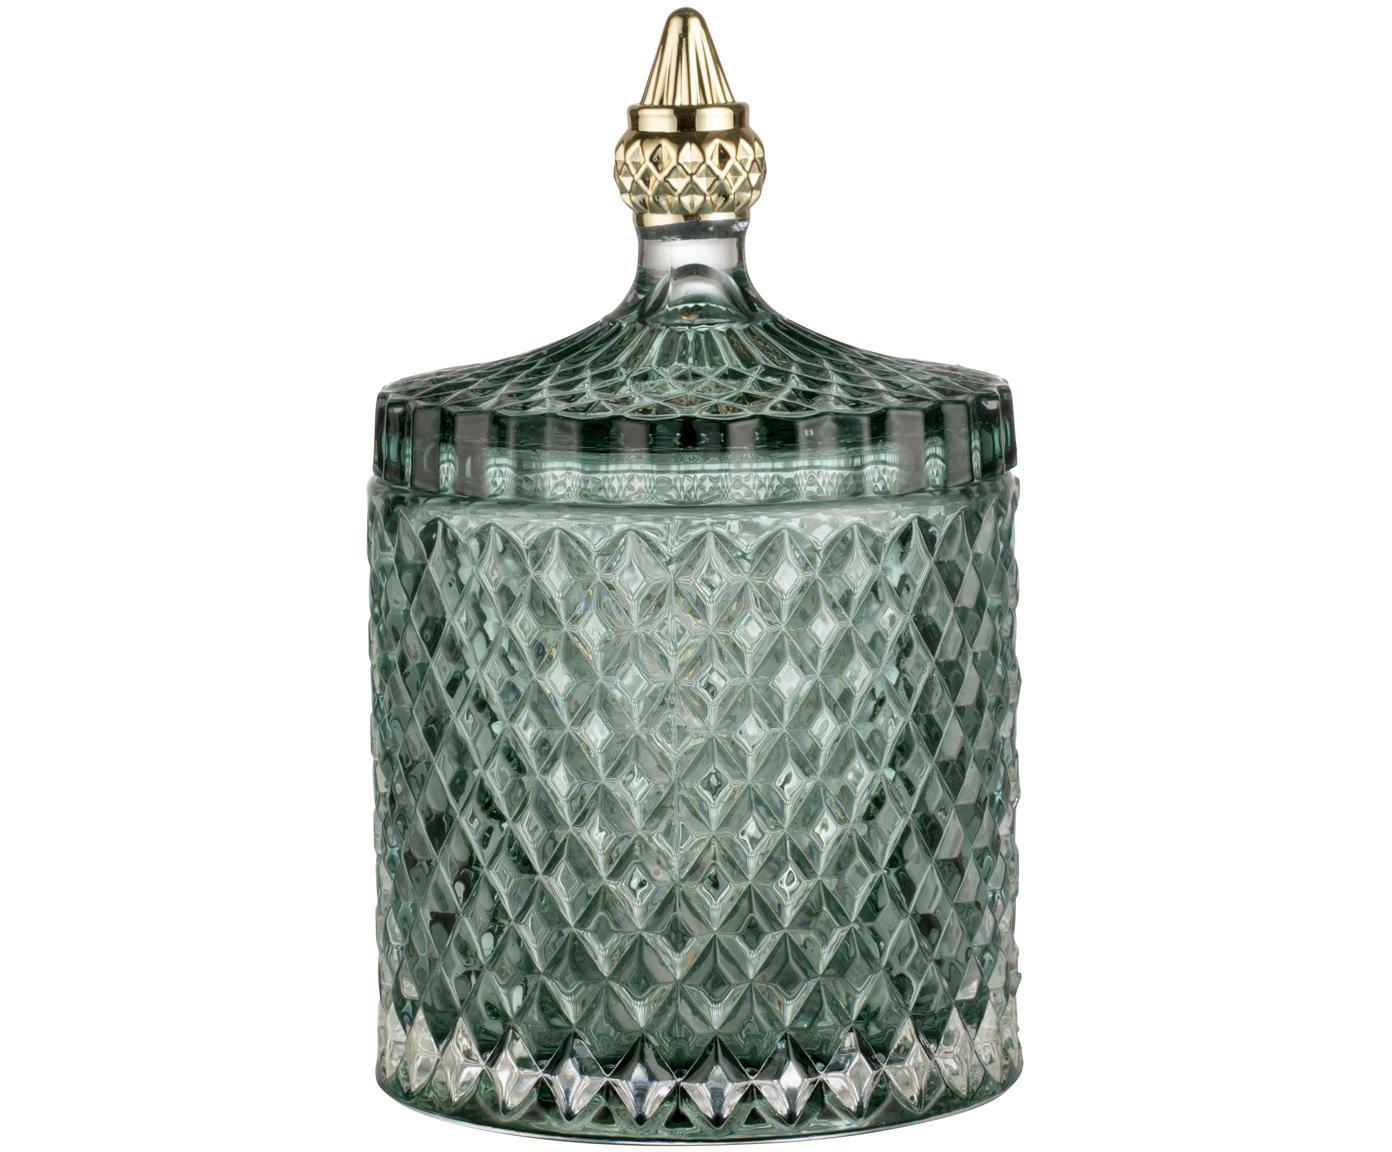 Opbergpot Miya, Glas, Groen, Ø 11 x H 18 cm